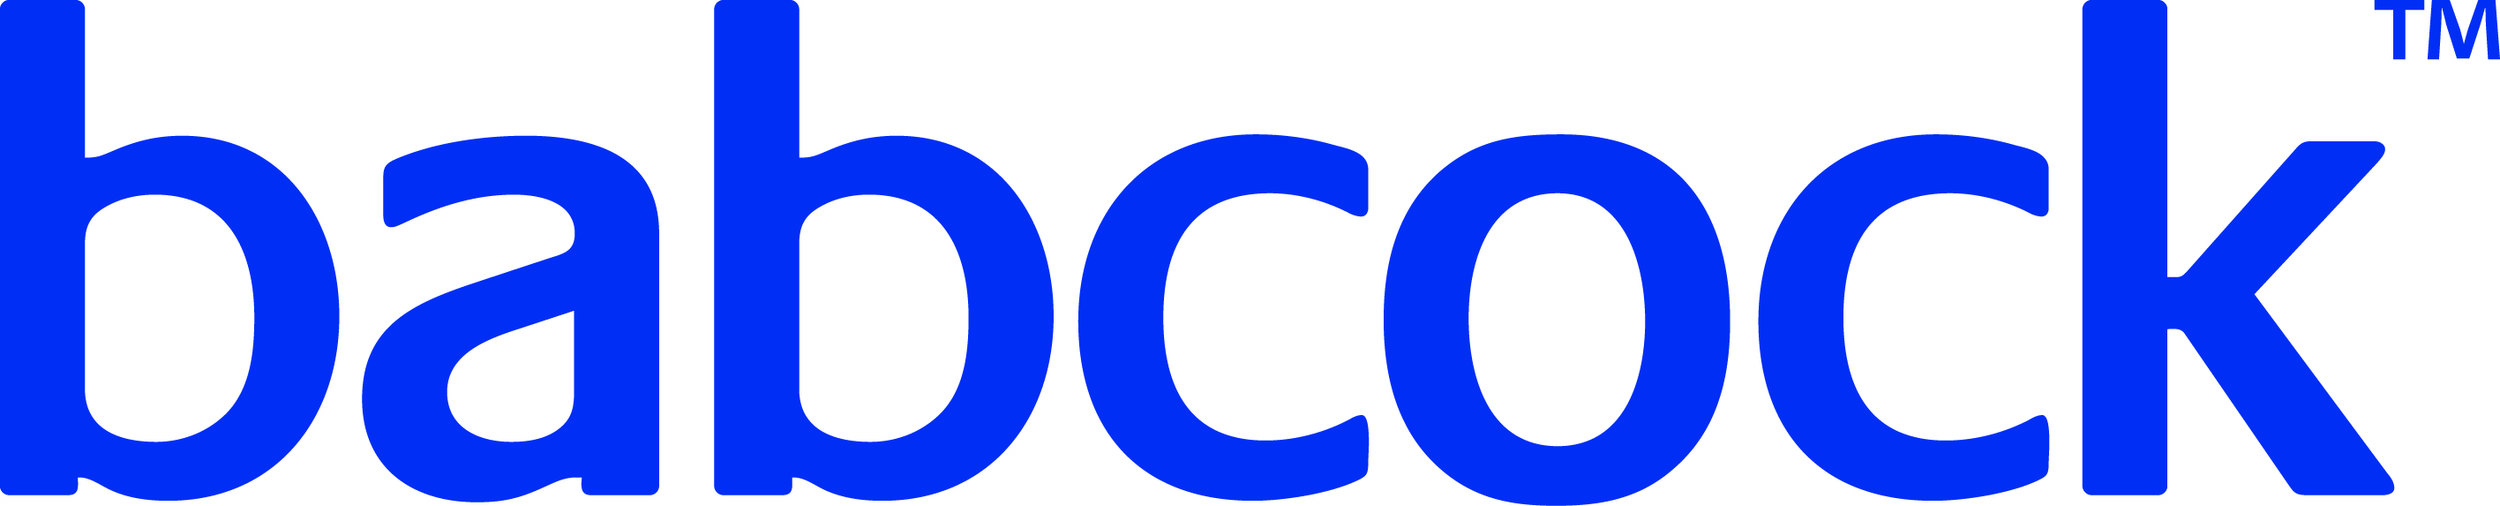 Babcock_Type_Only_BLUE_Logo.jpg